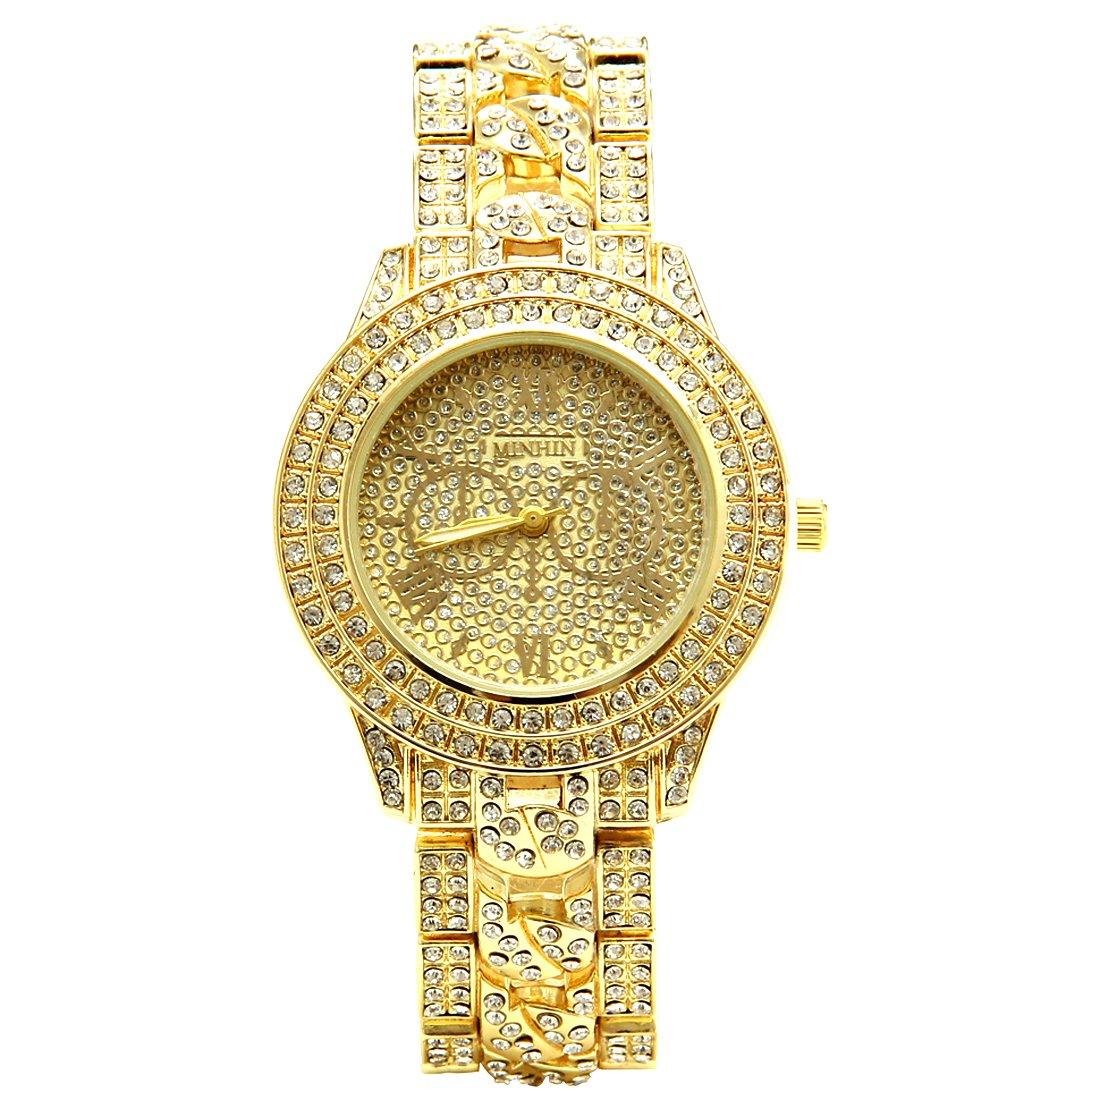 MINHIN Studded with Diamonds Alloy Geneva Geneva Watch Unisex Luxury Shiny Watches (Gold)